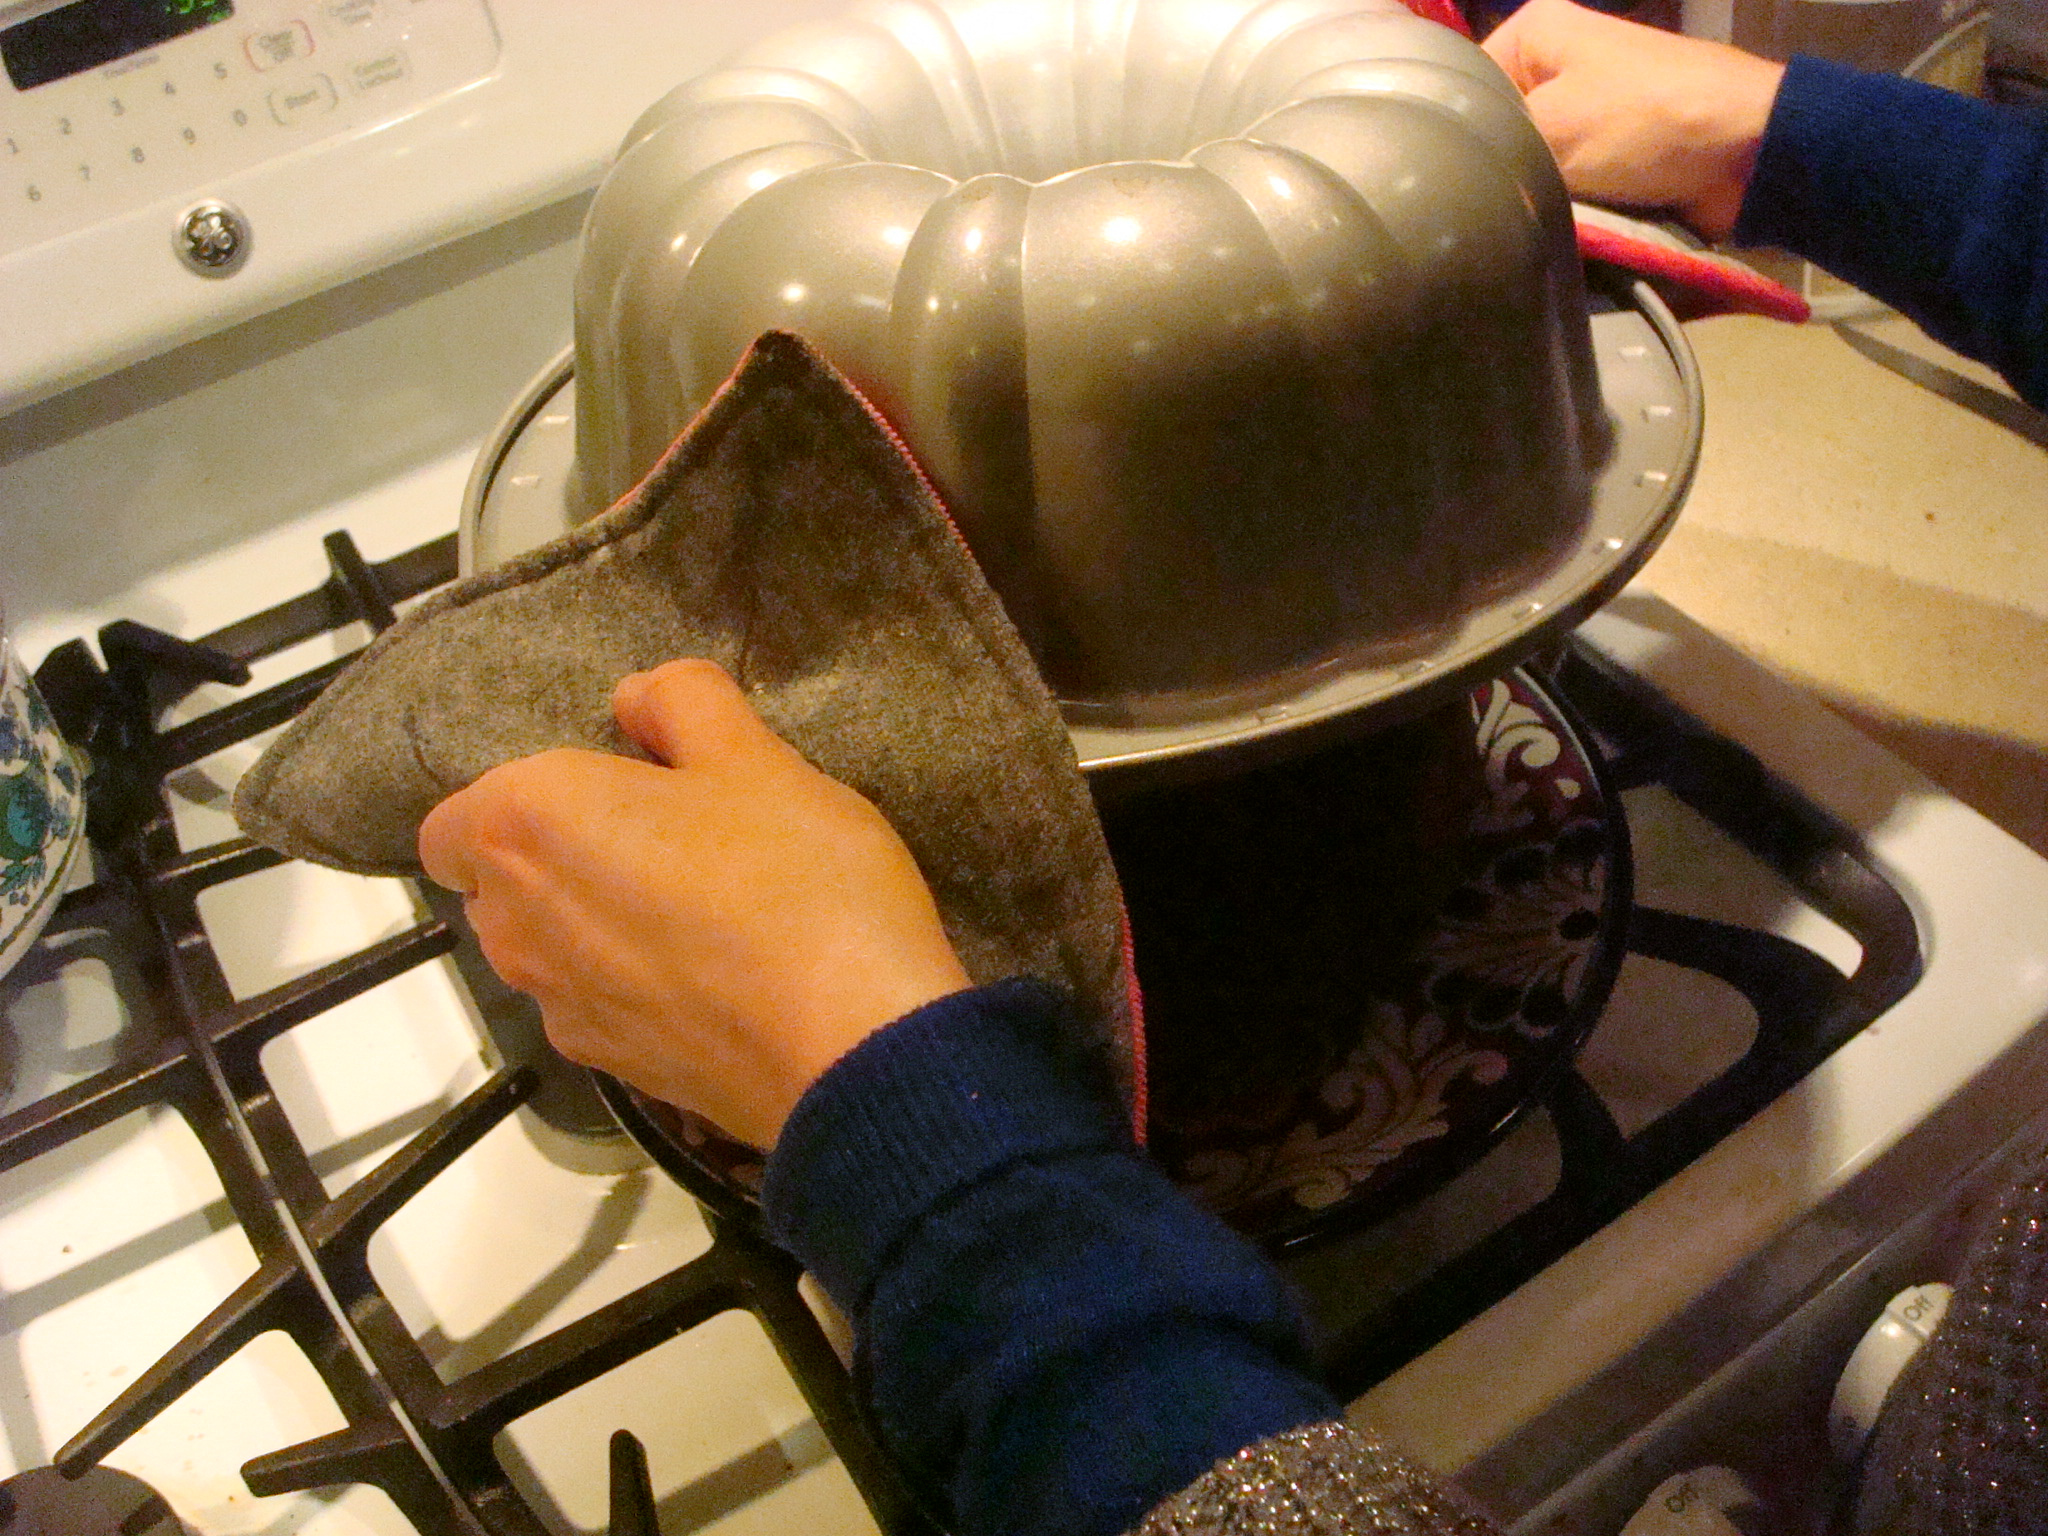 Lift the bundt pan